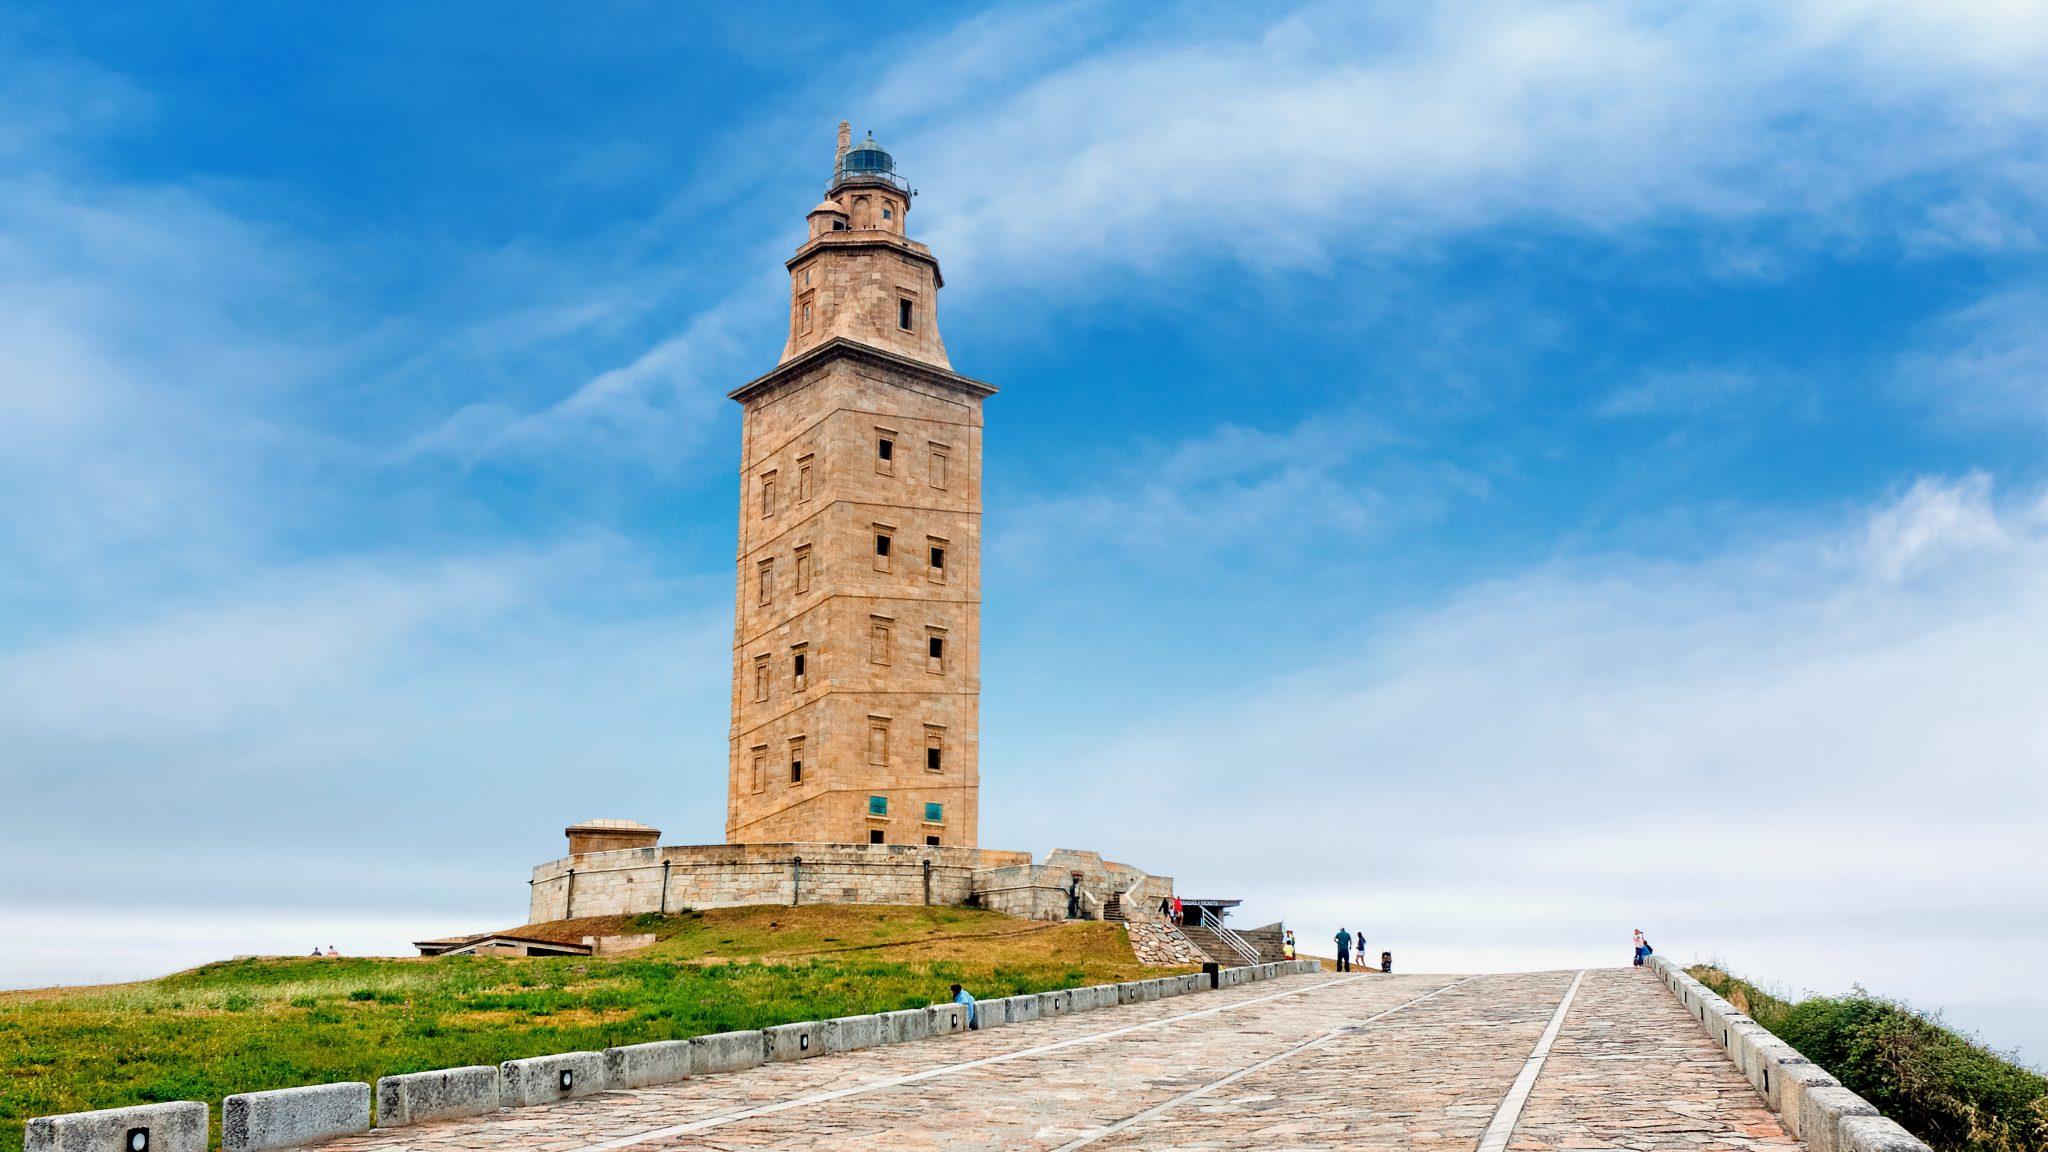 Torre de Hércules (Fuente: https://canalhistoria.es)